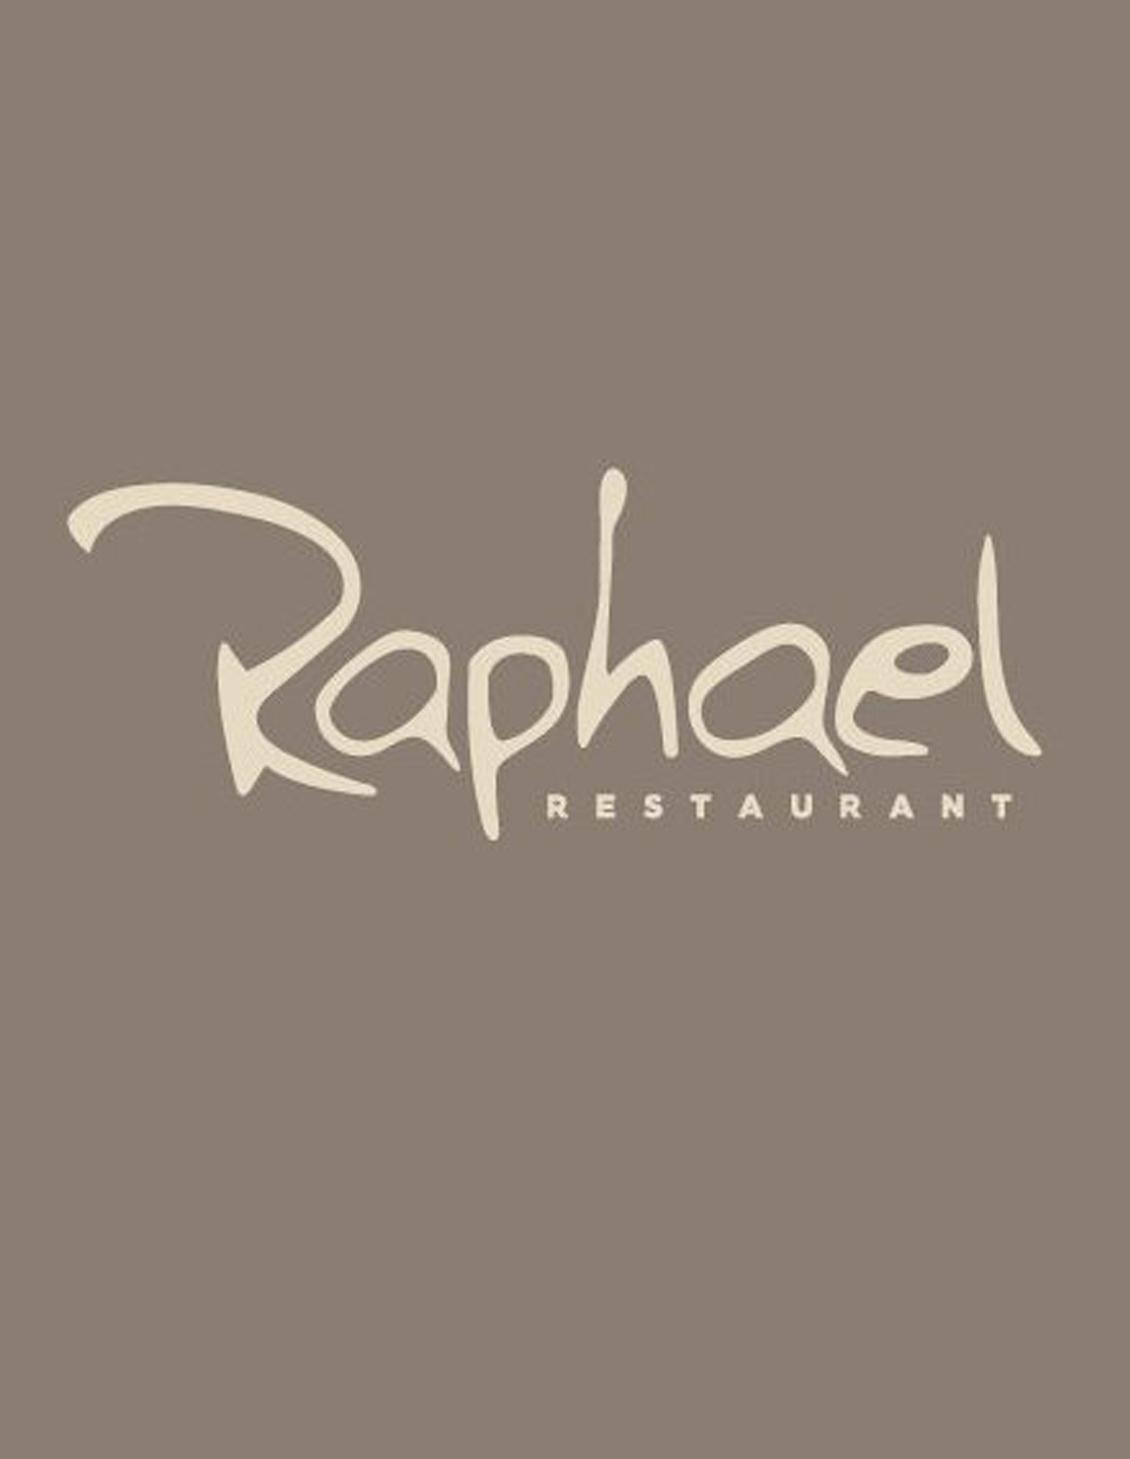 Rapheal